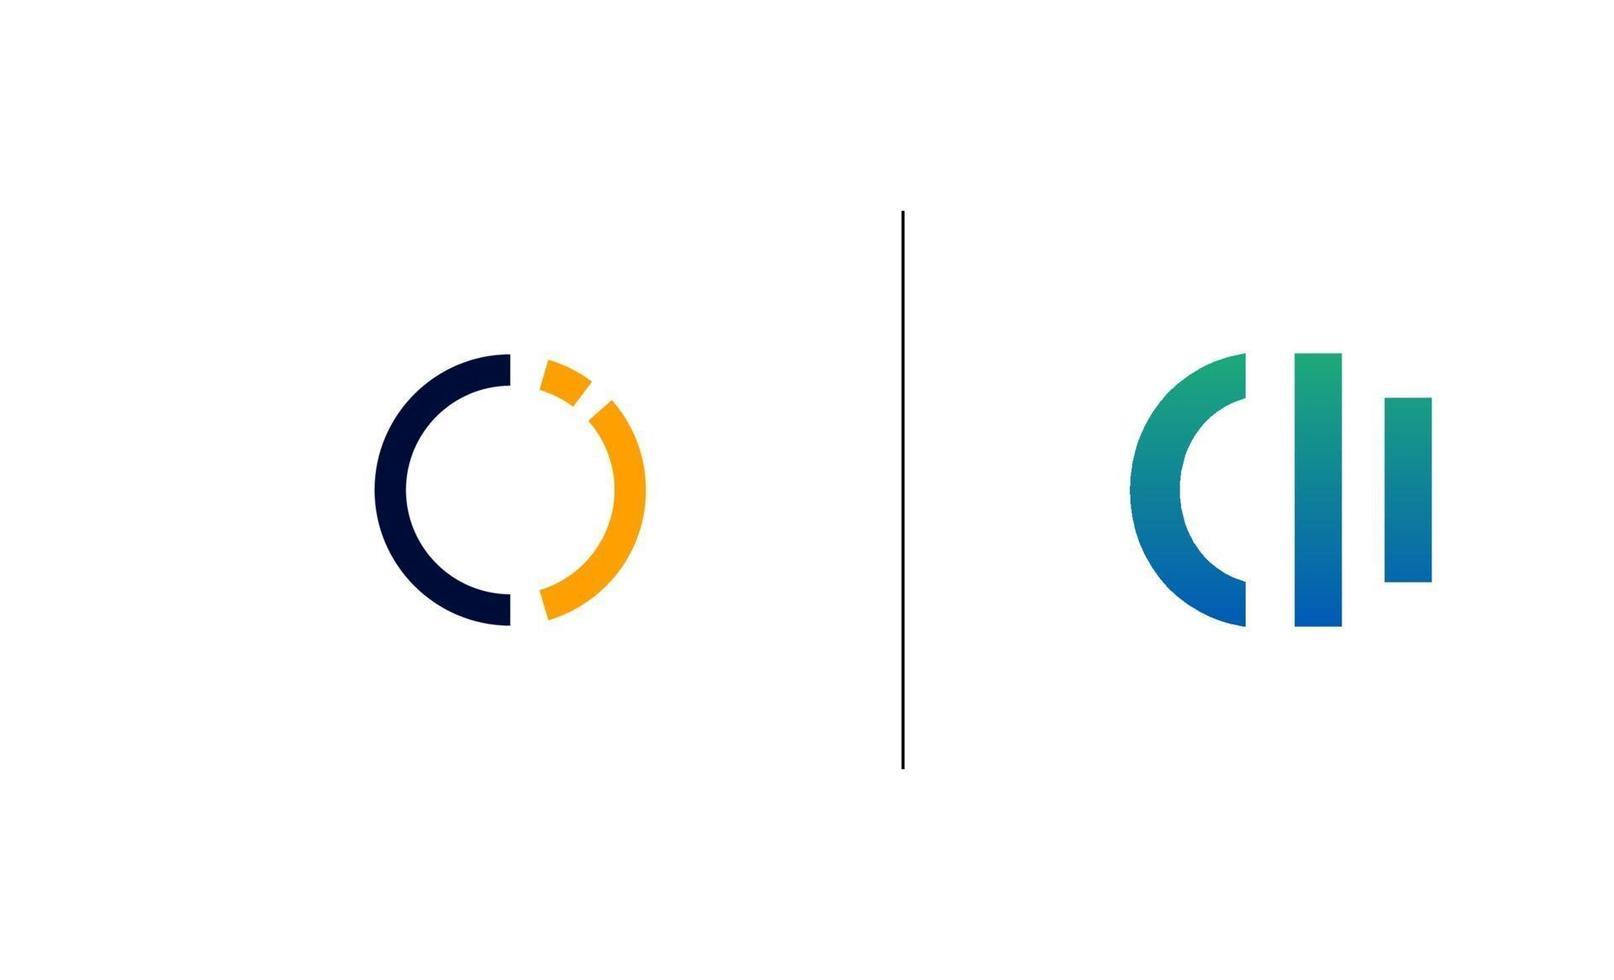 anfänglicher ci, ic Logo-Entwurfsschablonenvektor vektor